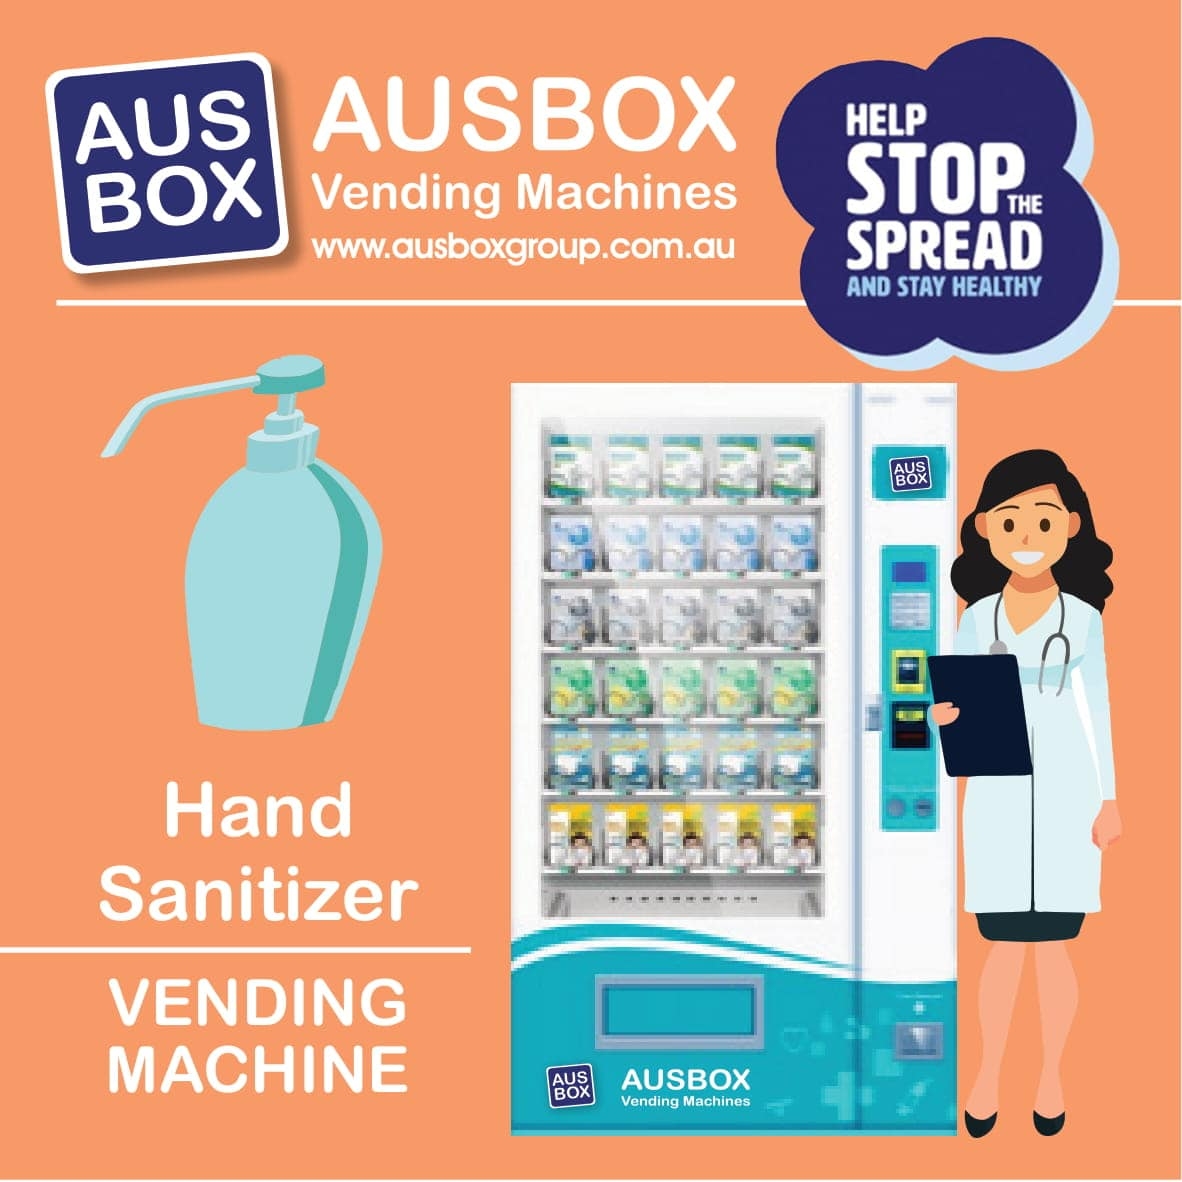 Hand Sanitizer Vending Machine